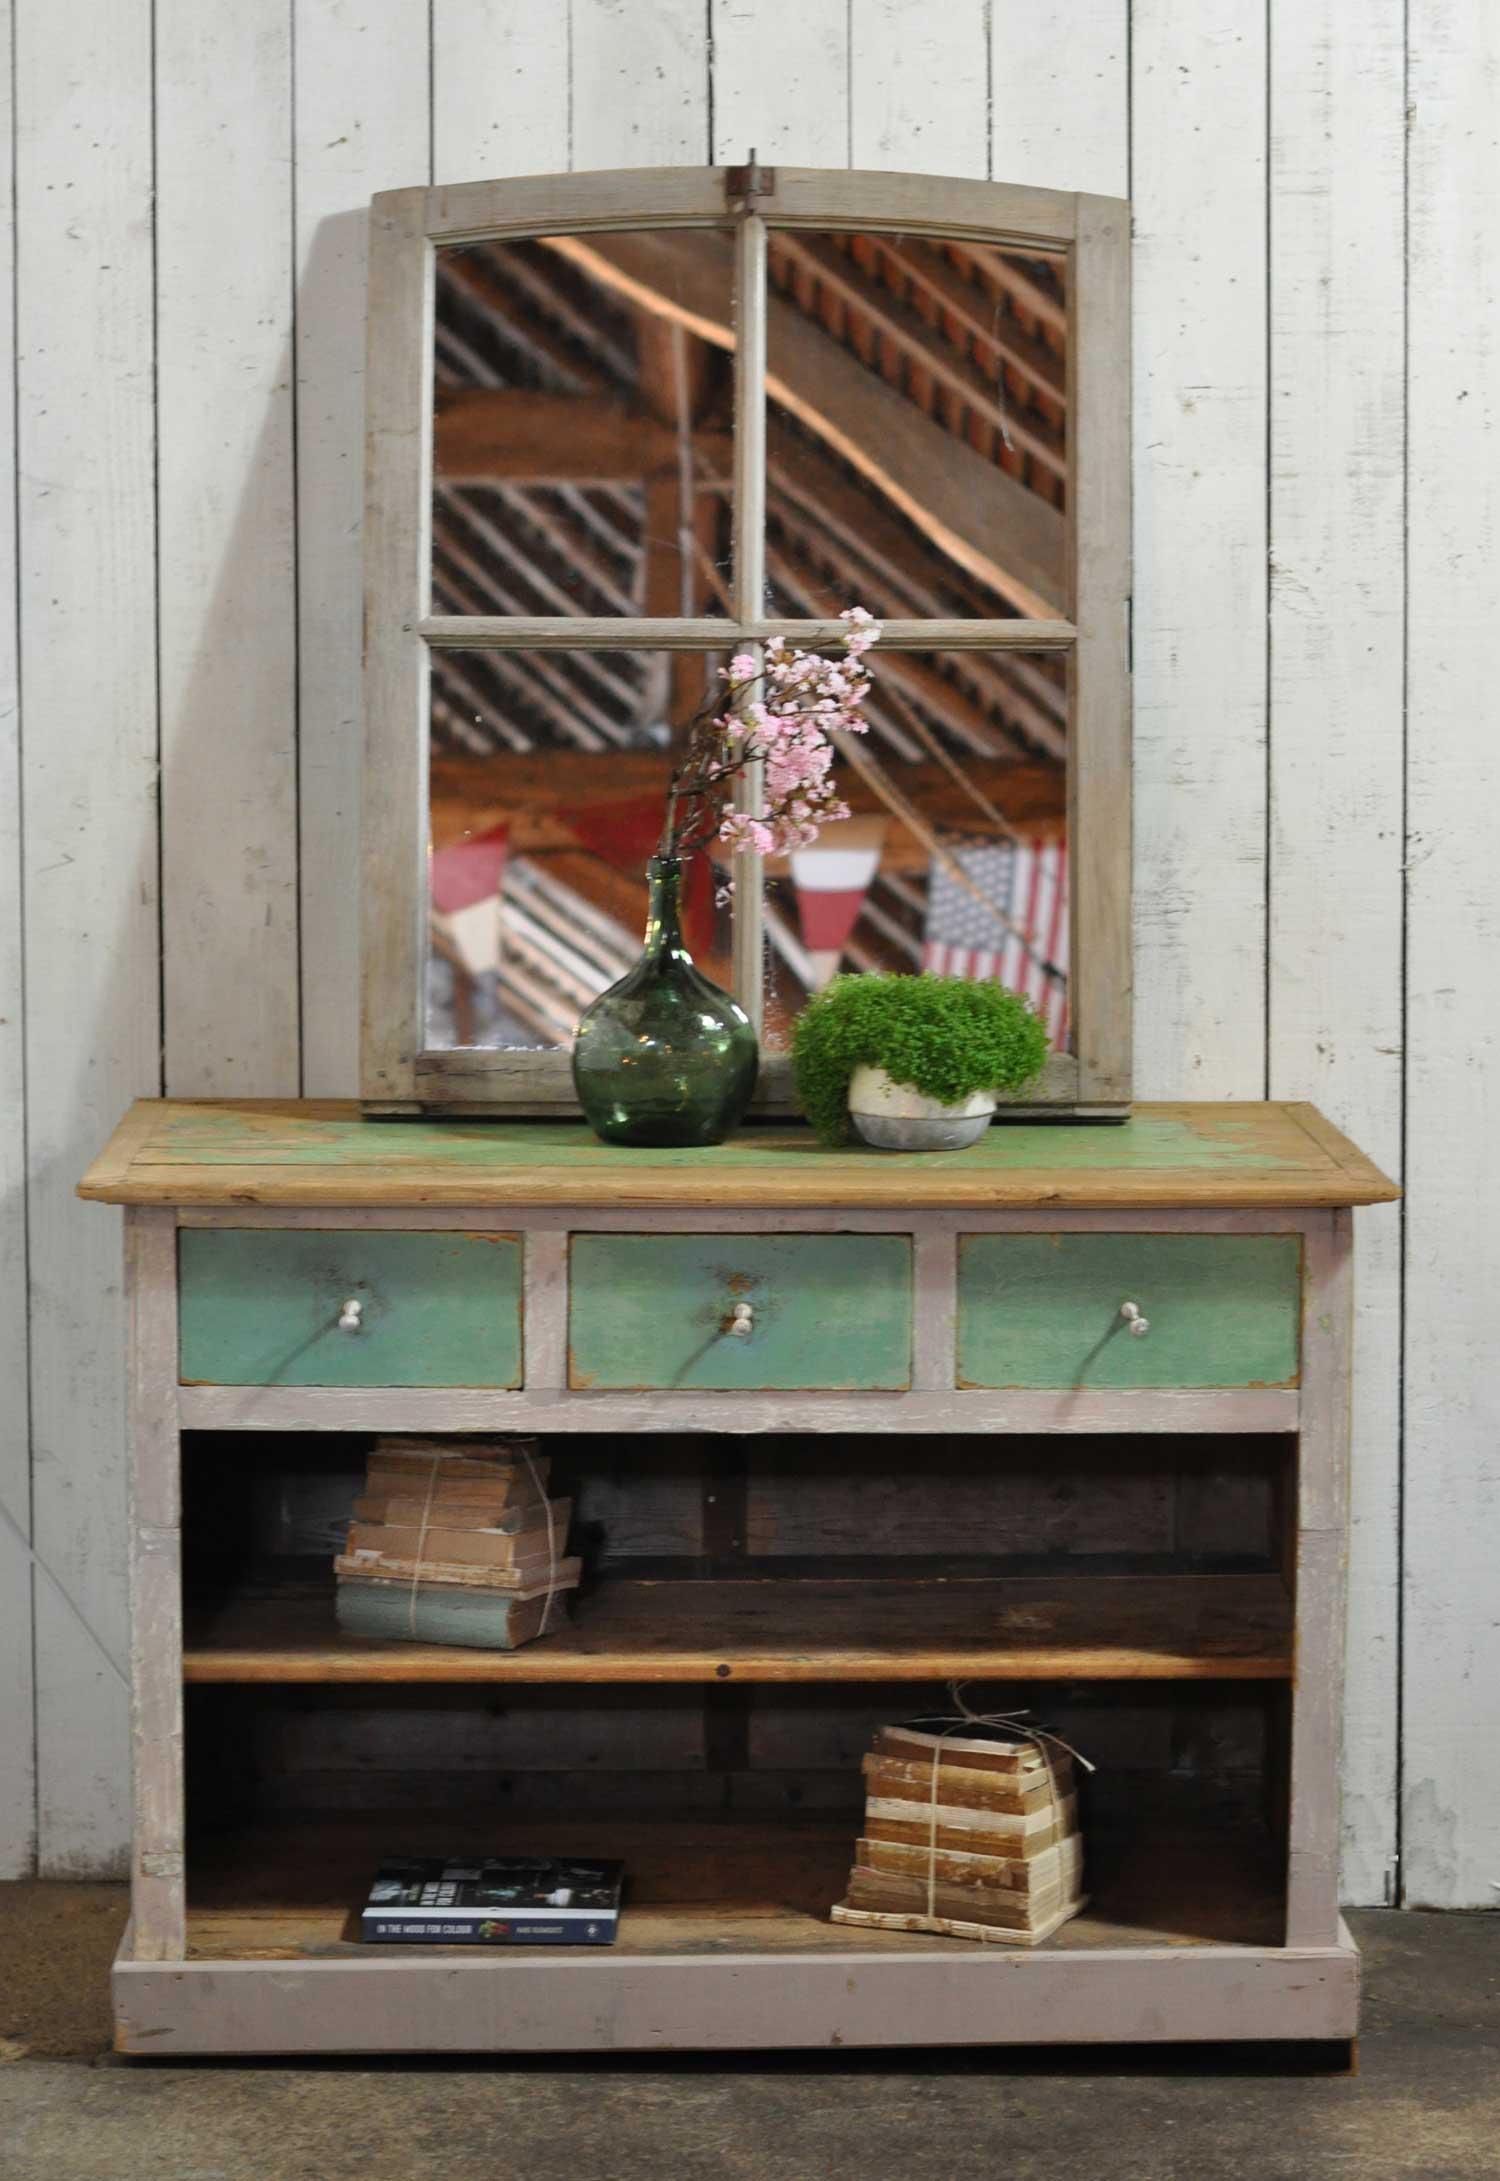 Antique Pine Shop Counter With Original Aqua Paintwork